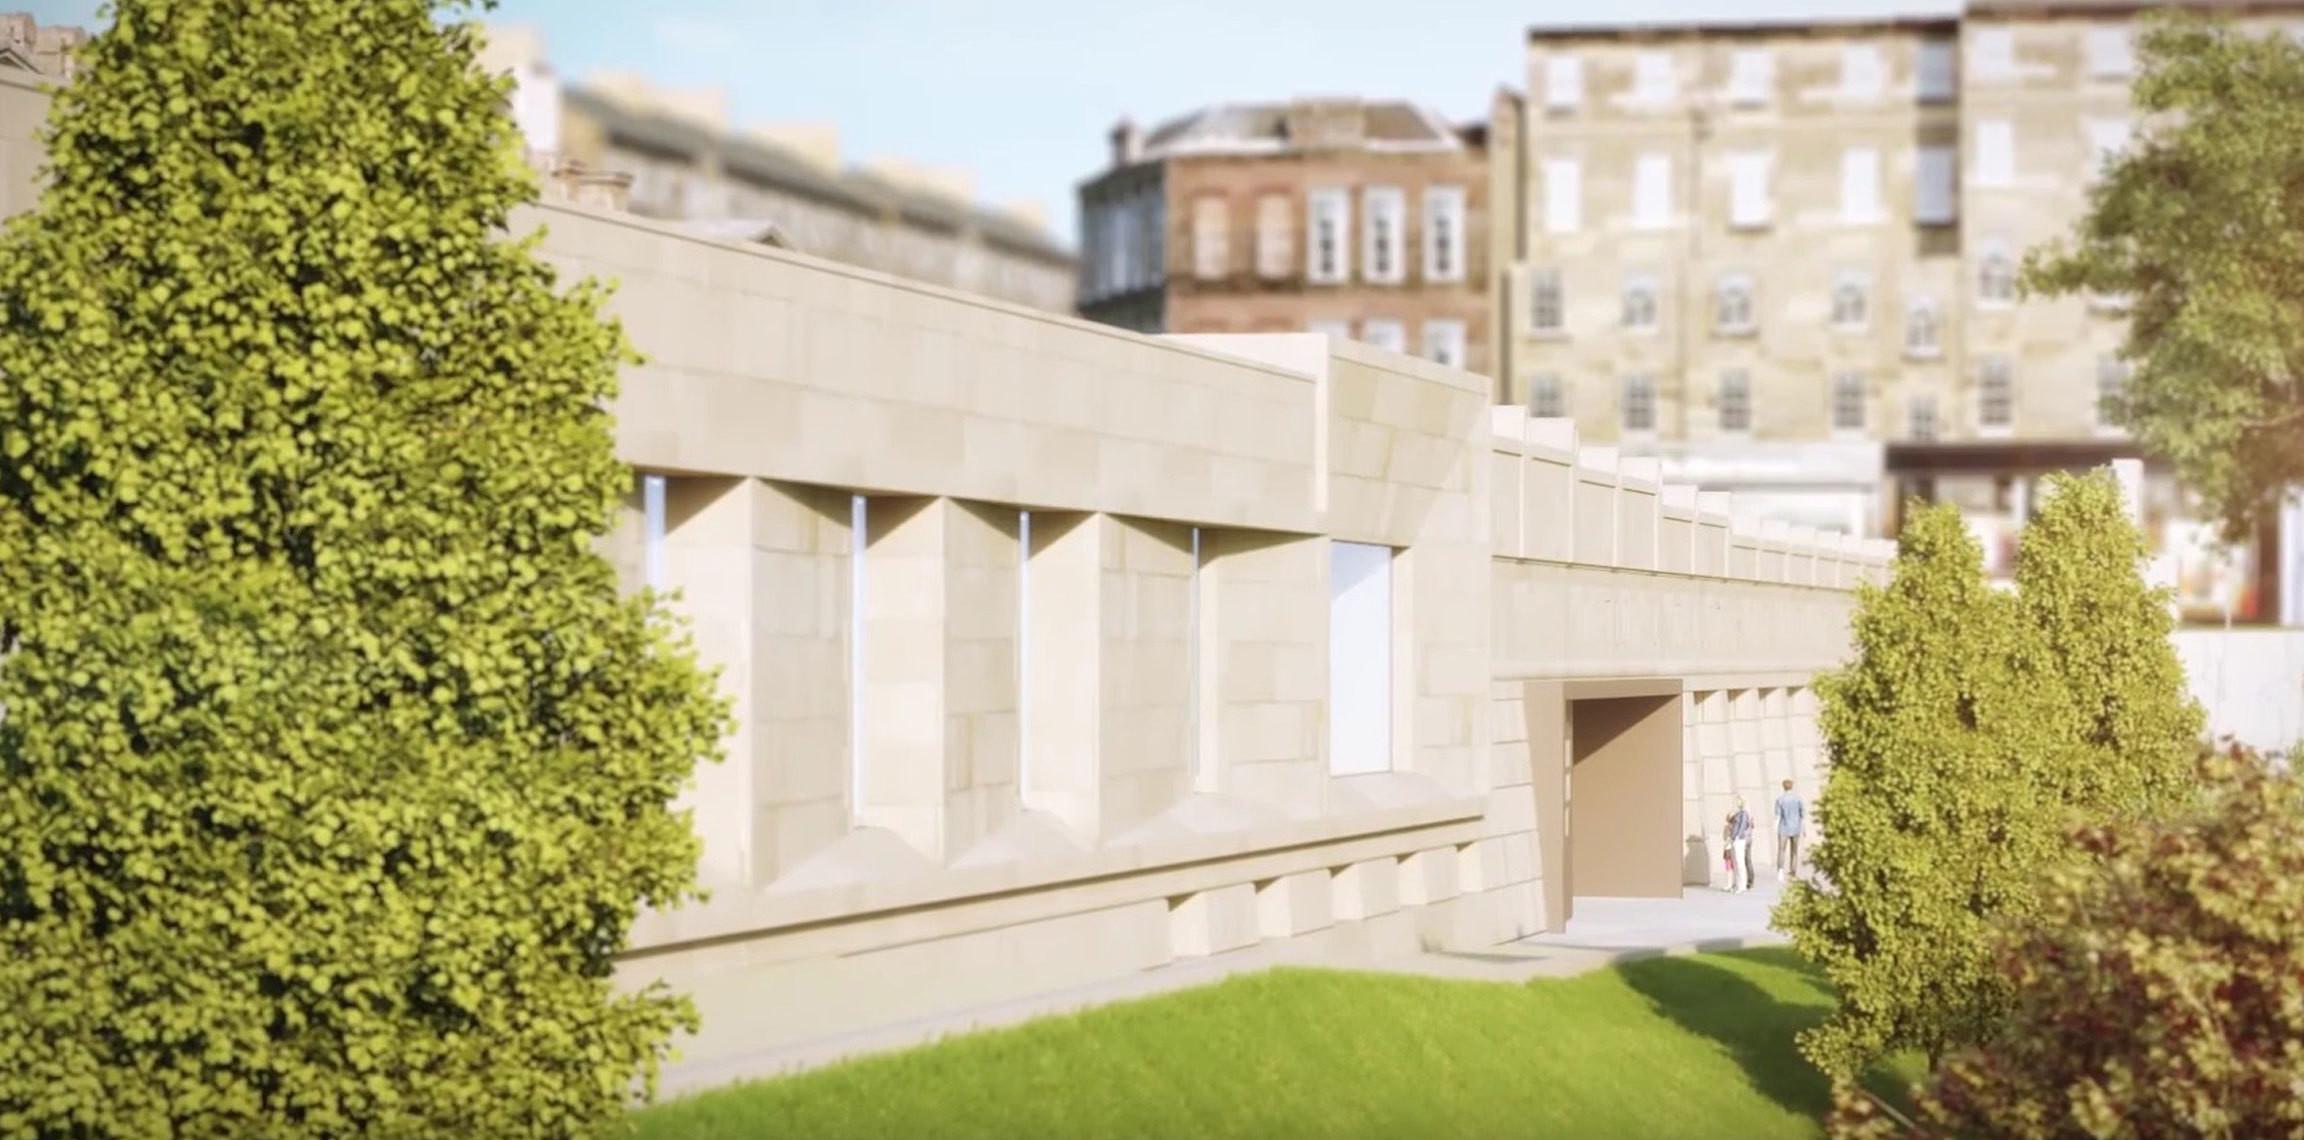 Case Study: Scottish National Galleries